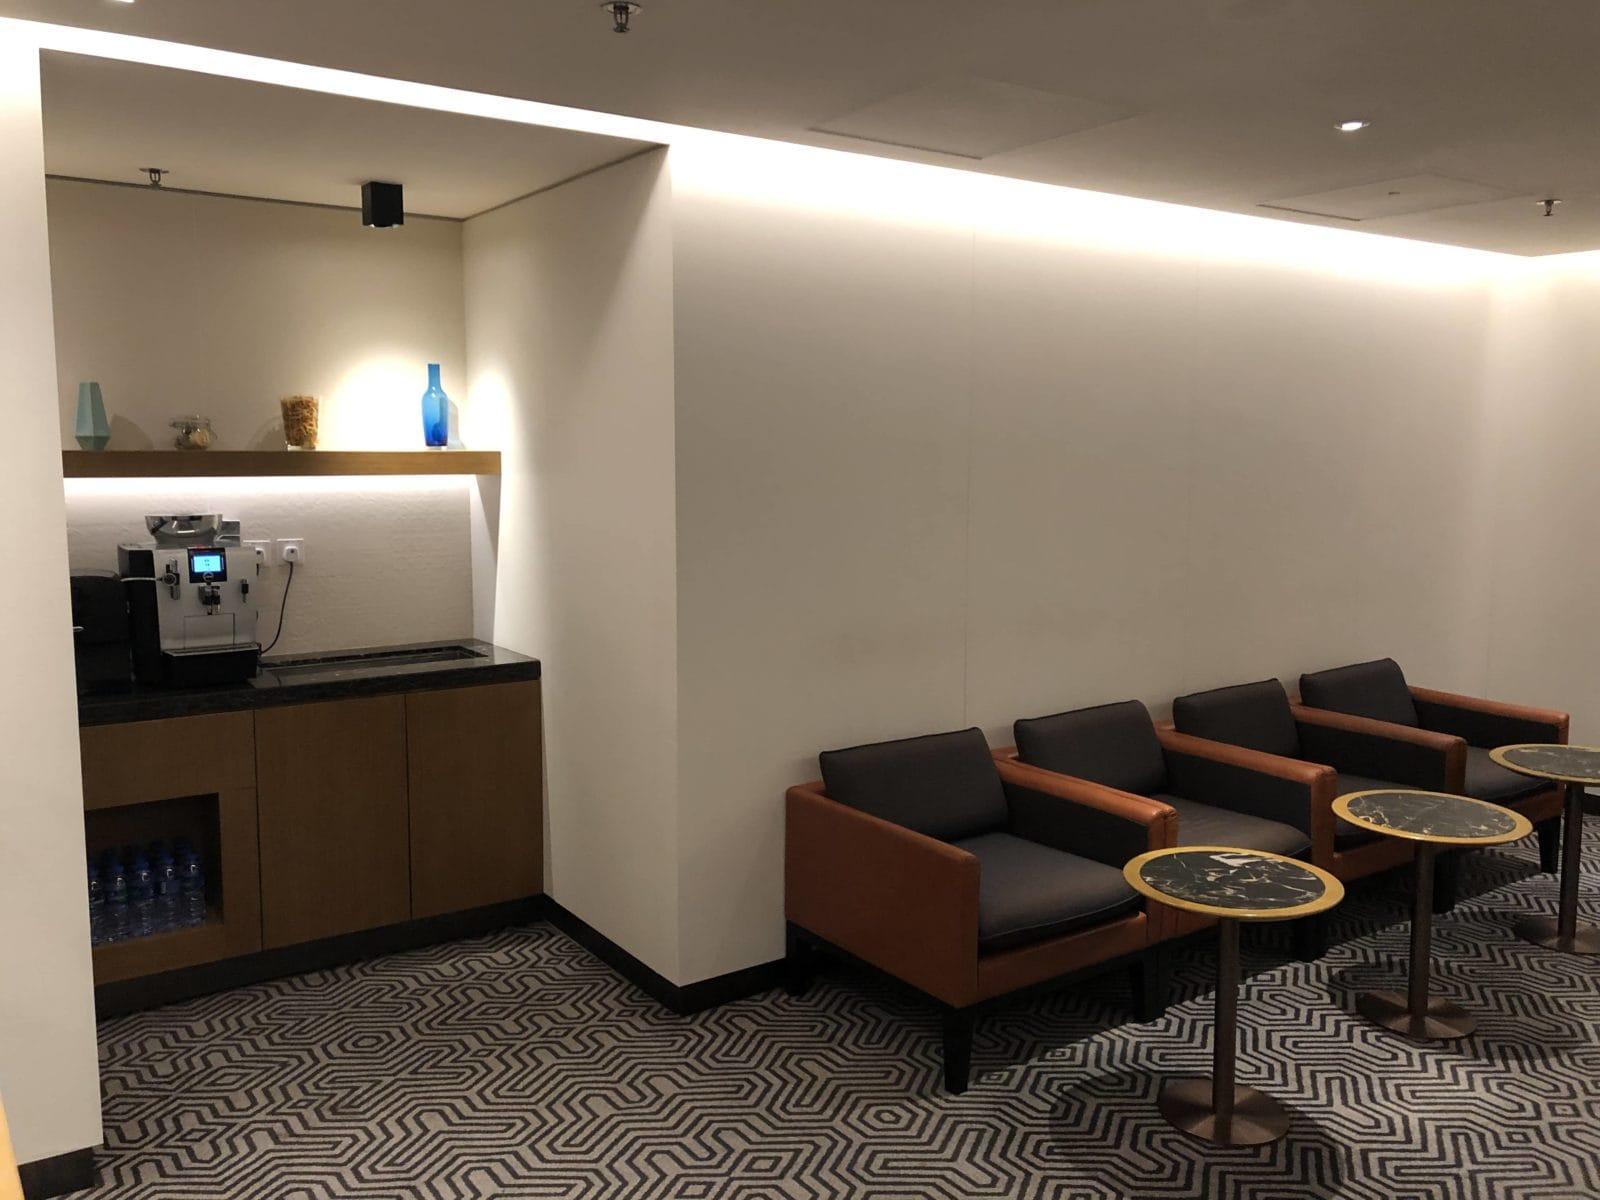 Singapore Airlines SilverKris Lounge Hong Kong Eingangsbereich